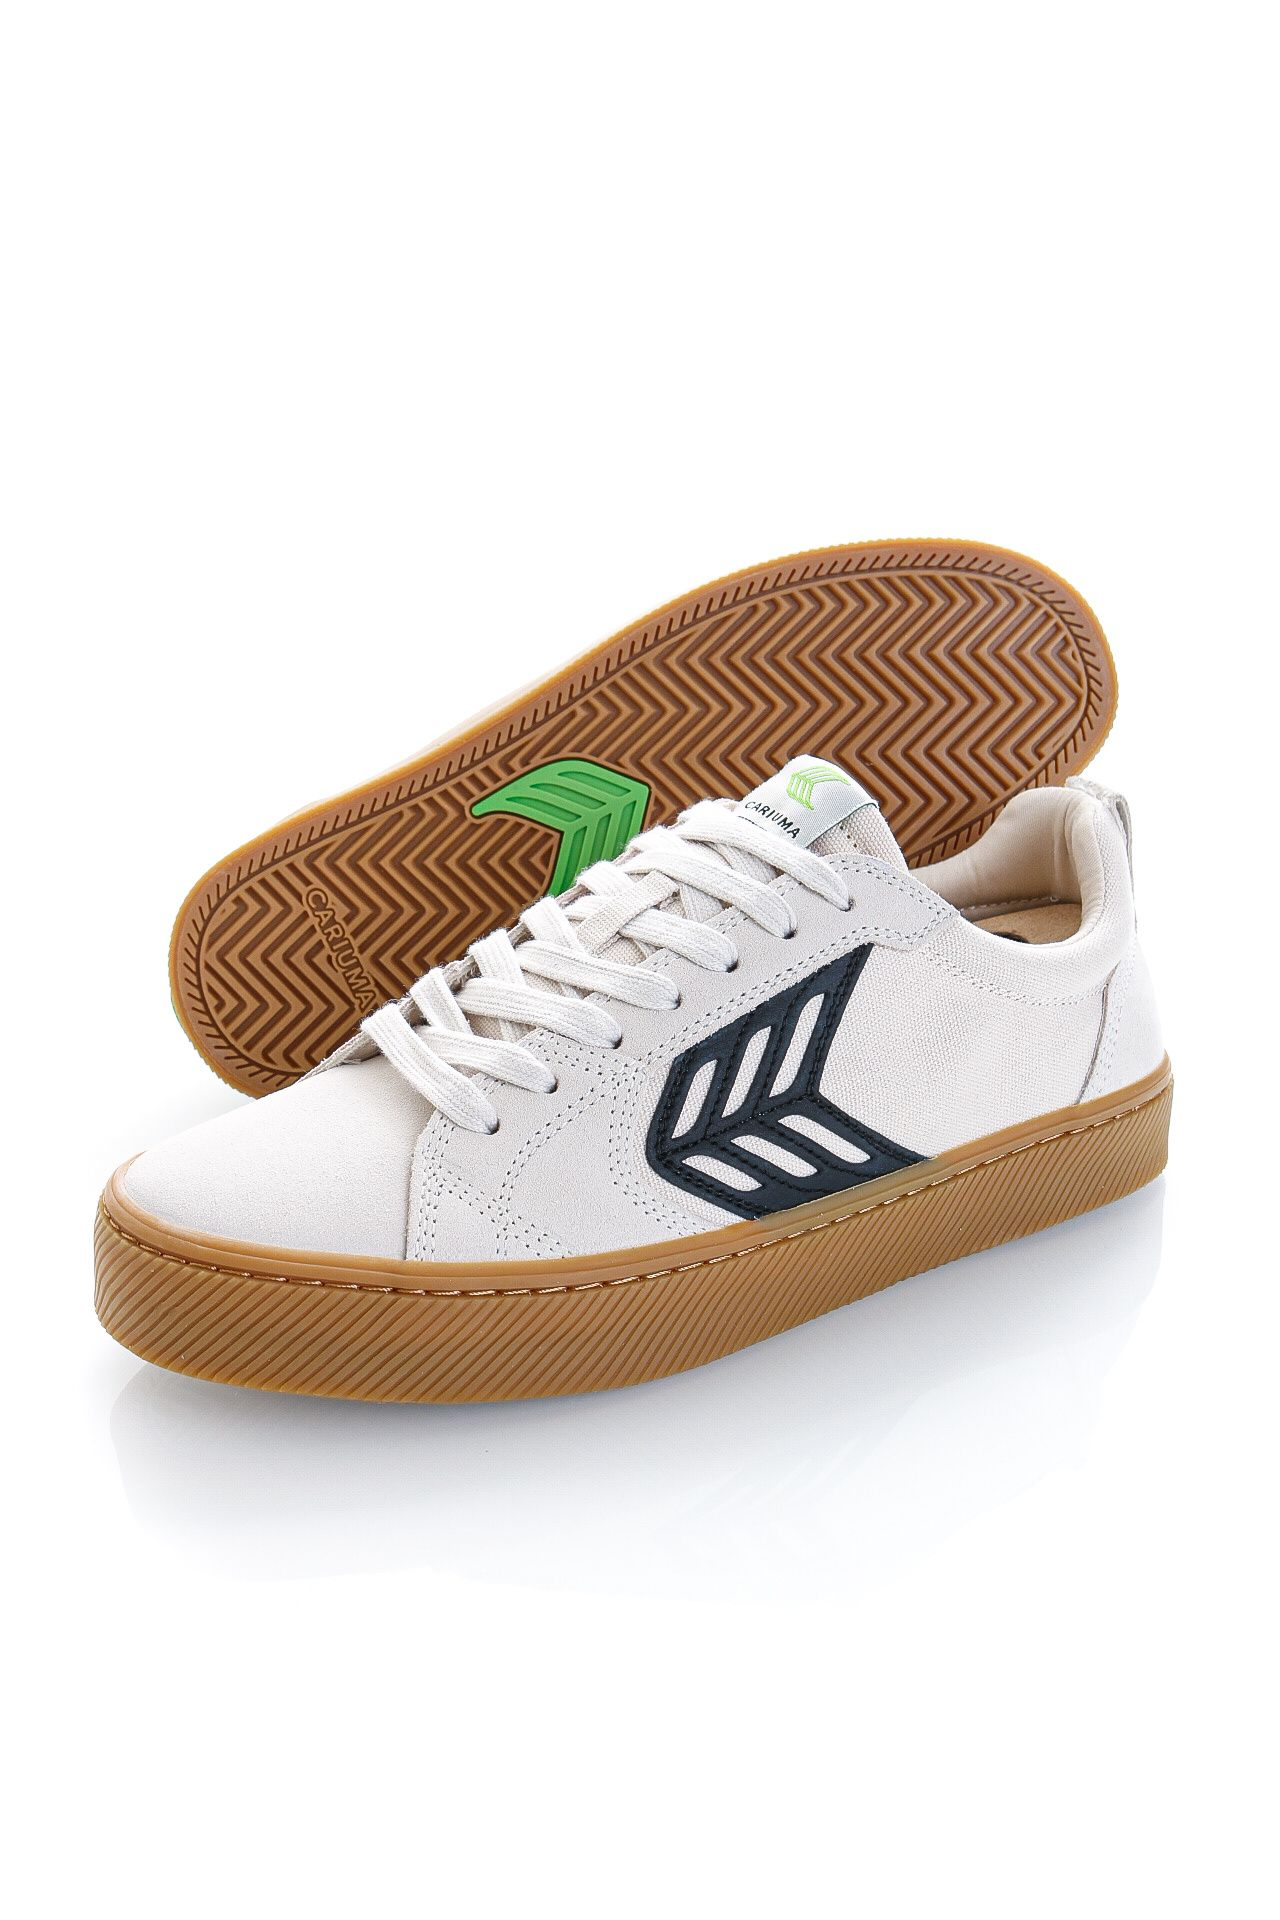 Afbeelding van Cariuma Sneakers CATIBA PRO Skate Black Logo Gum Vintage White Suede and Canvas Black 400807W15M080